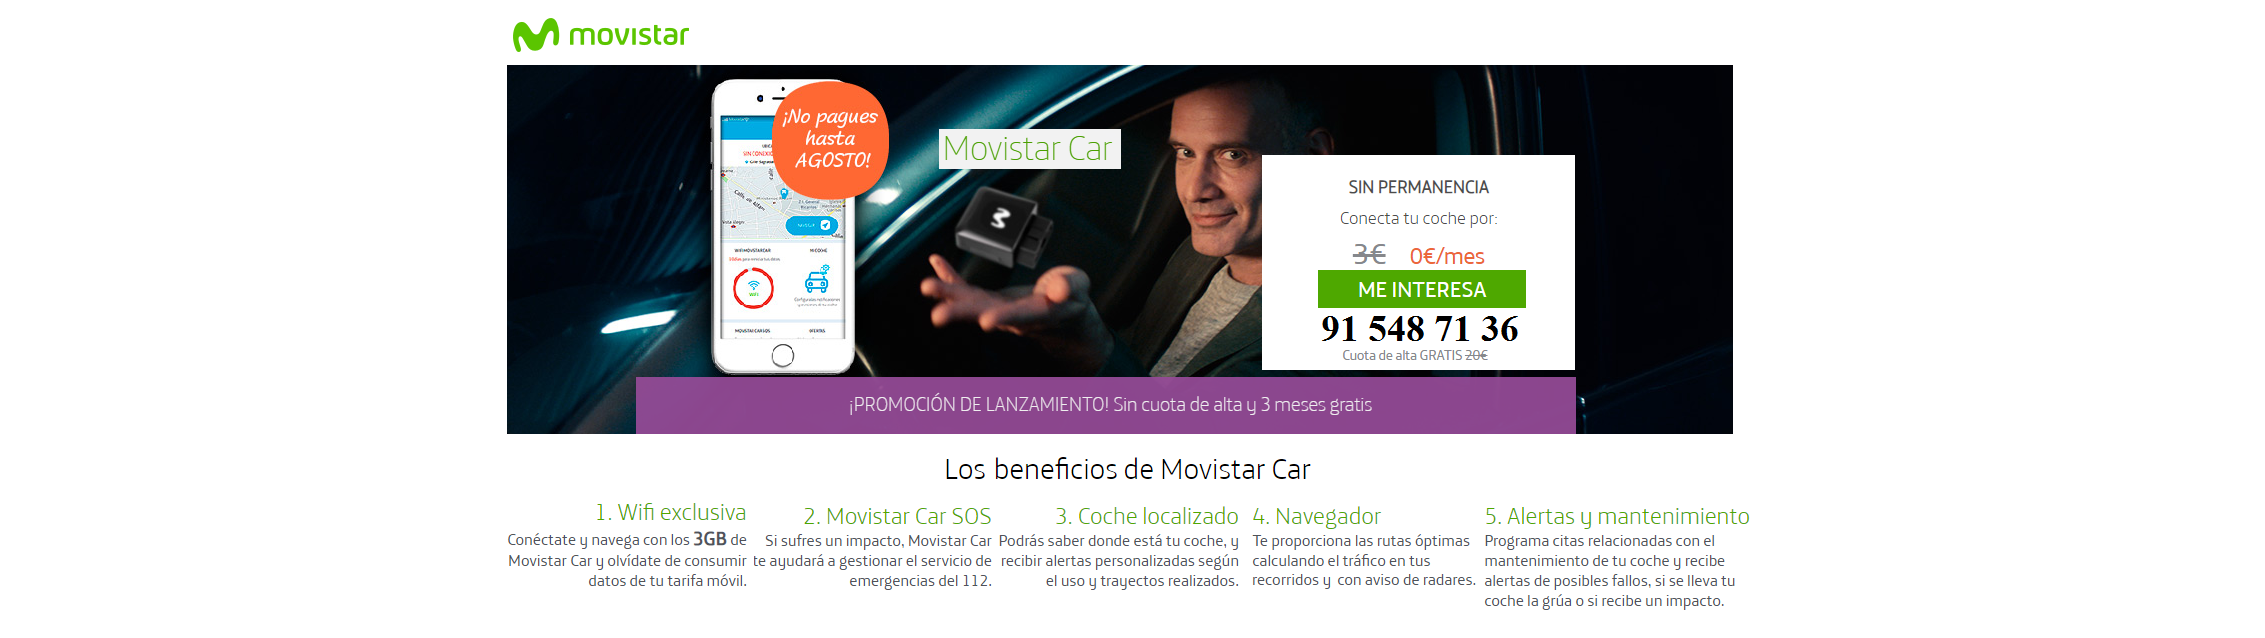 MOVISTAR-CAR-PARA-WEB-1